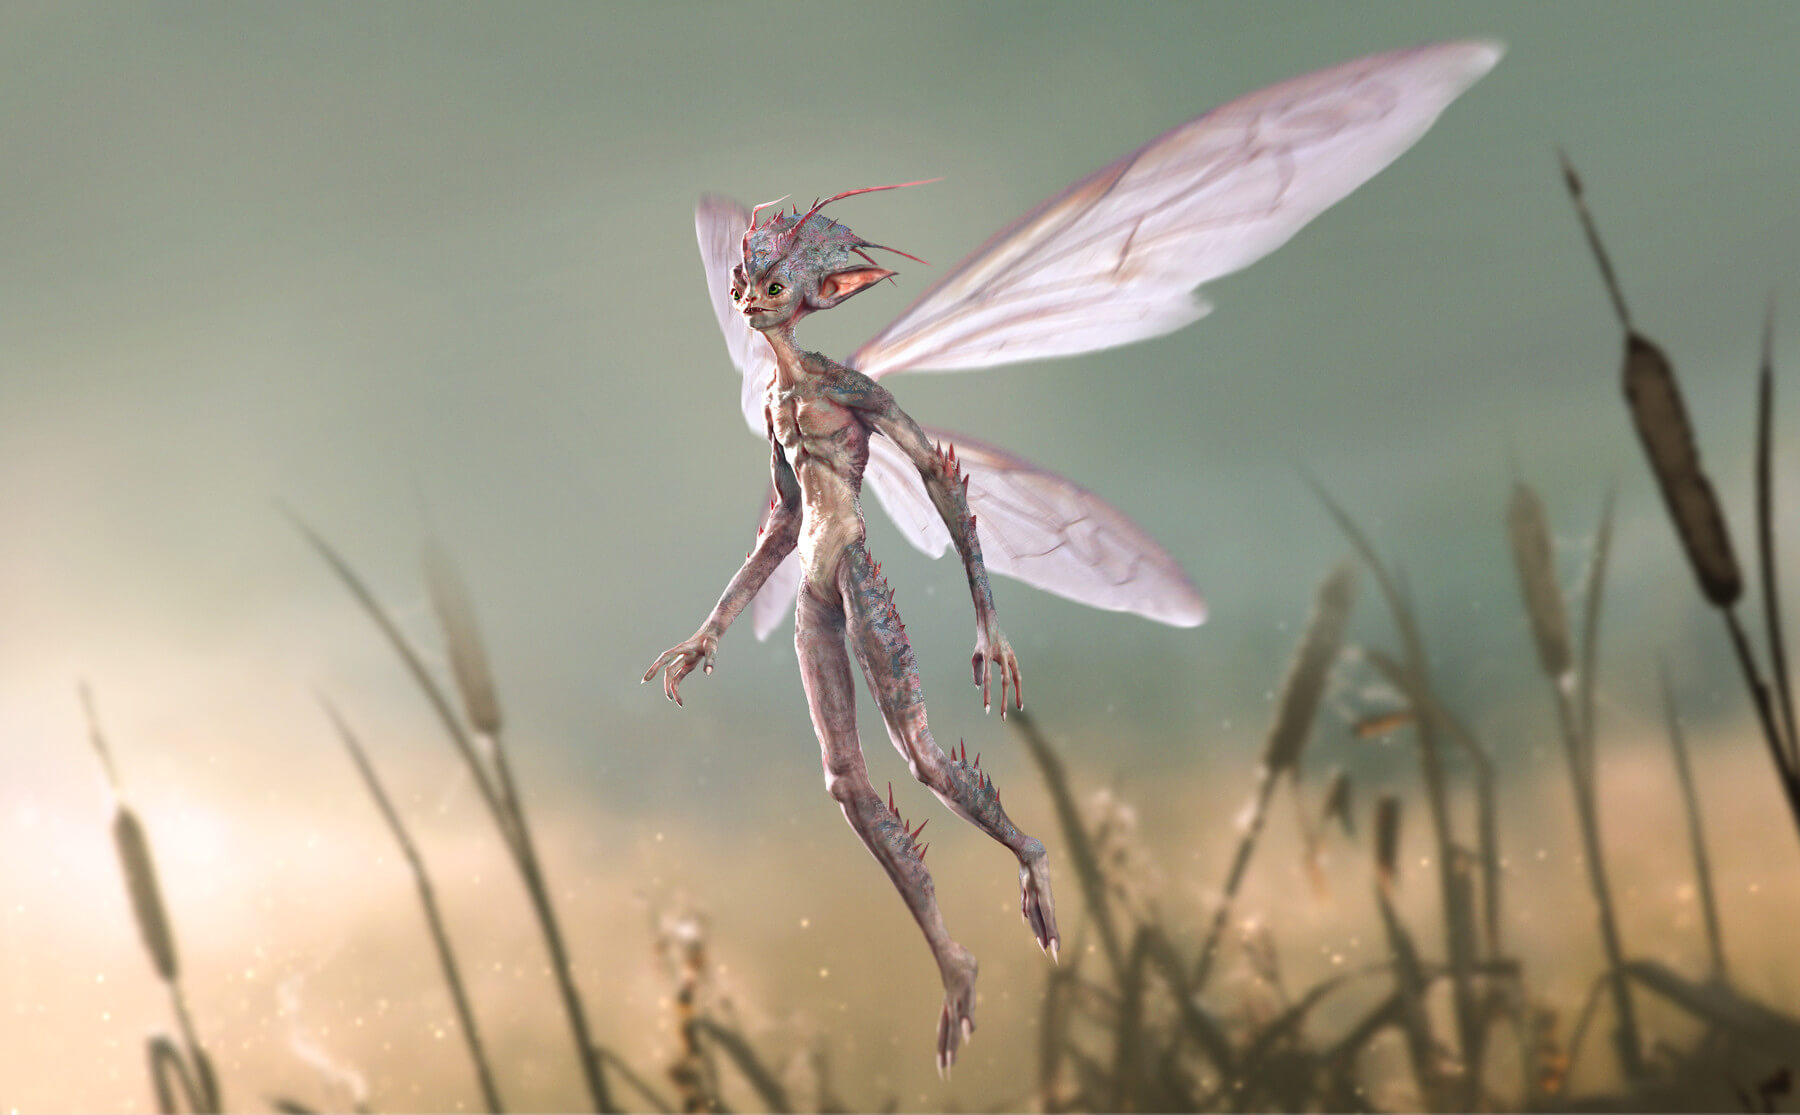 Atomhawk_News_Sep2017_InTheMedia_3DTotal_MickMowatConceptArt_Fairy.jpg